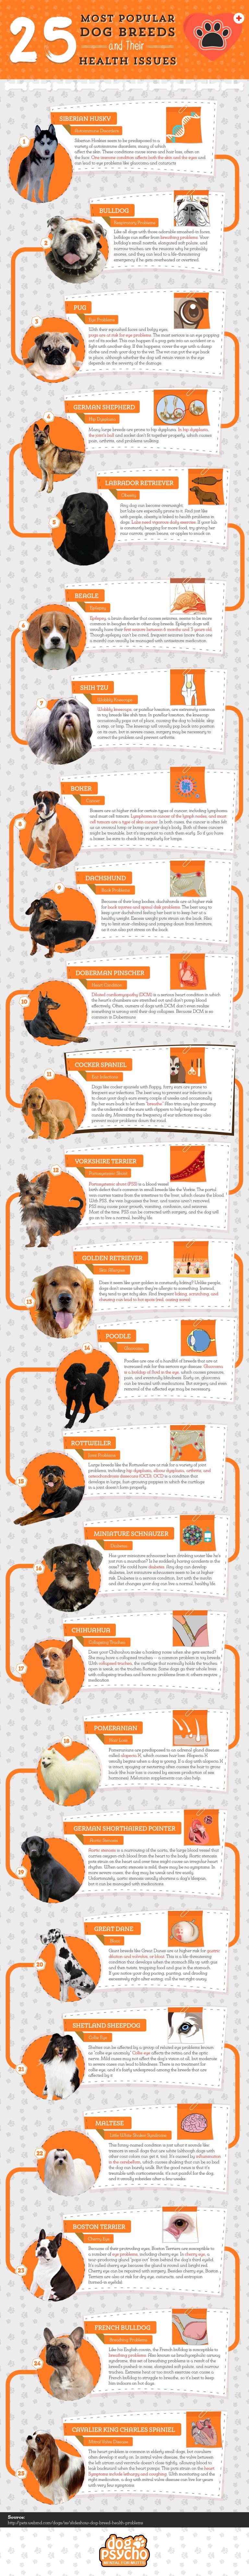 Oasdom.com - dog-breeds-and-their-health-issues